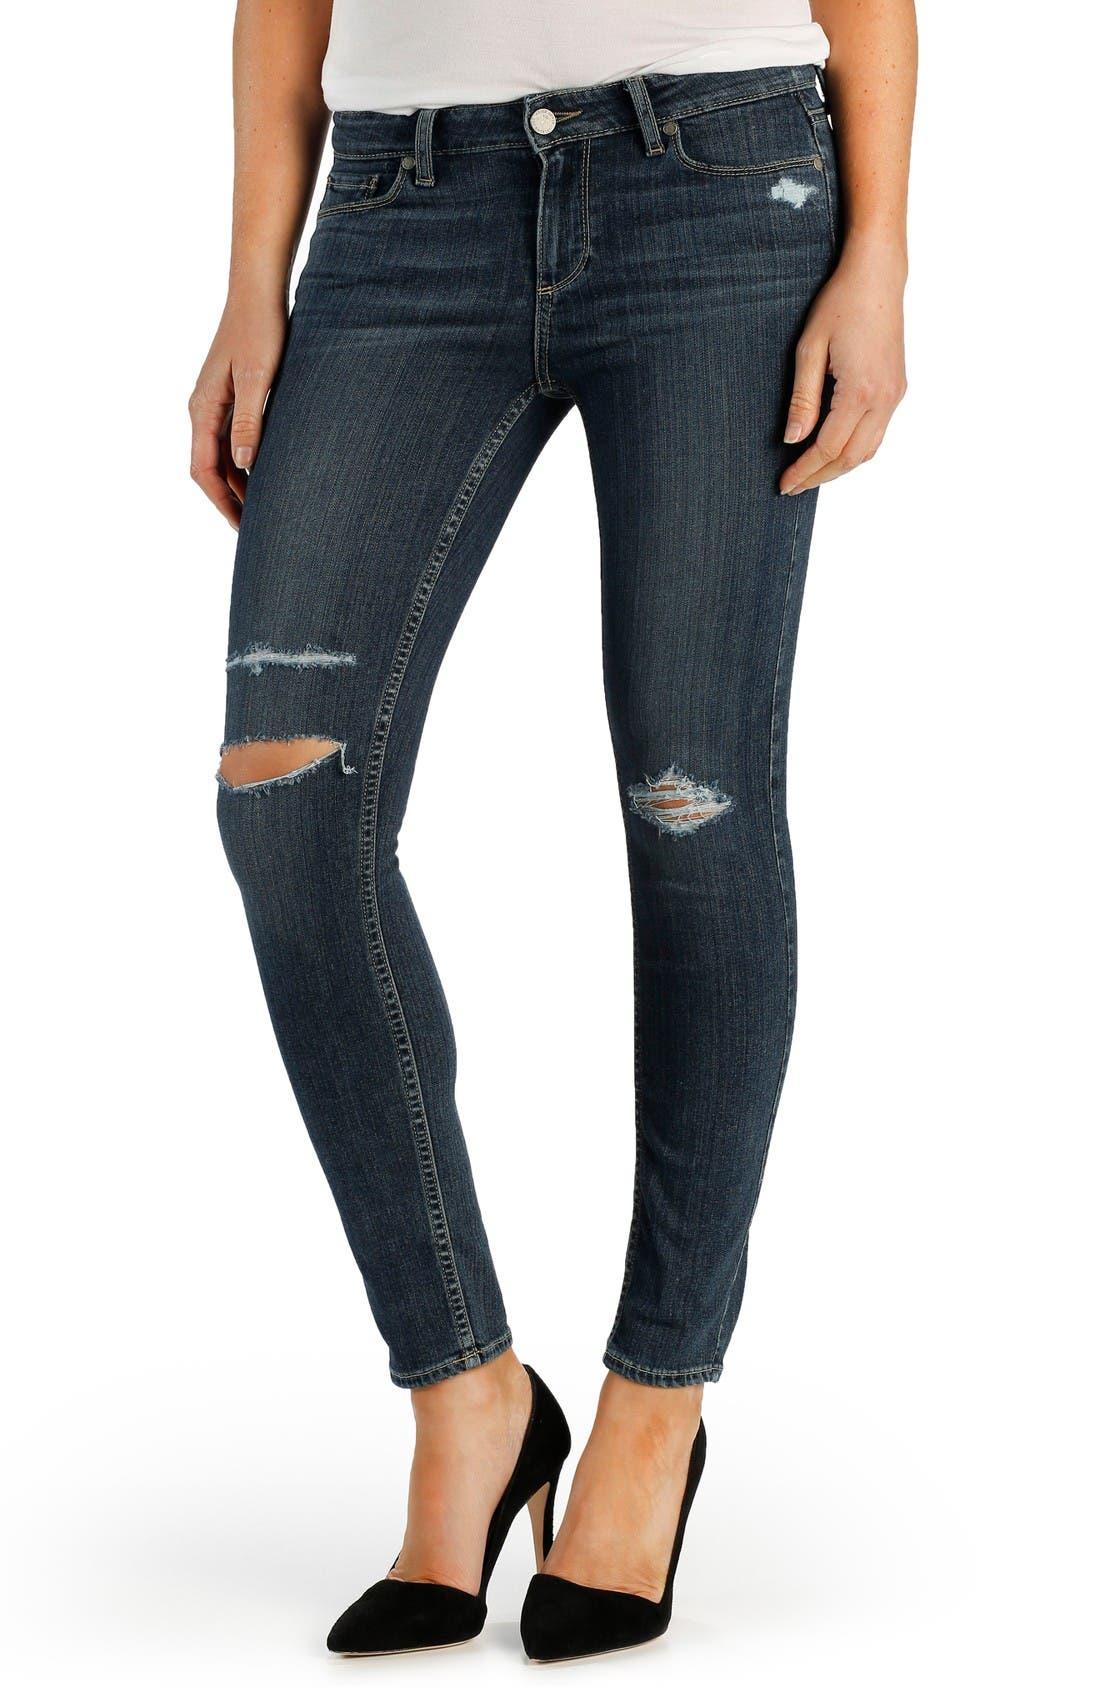 Main Image - PAIGE Transcend - Verdugo Ankle Ultra Skinny Jeans (Adira Destructed)